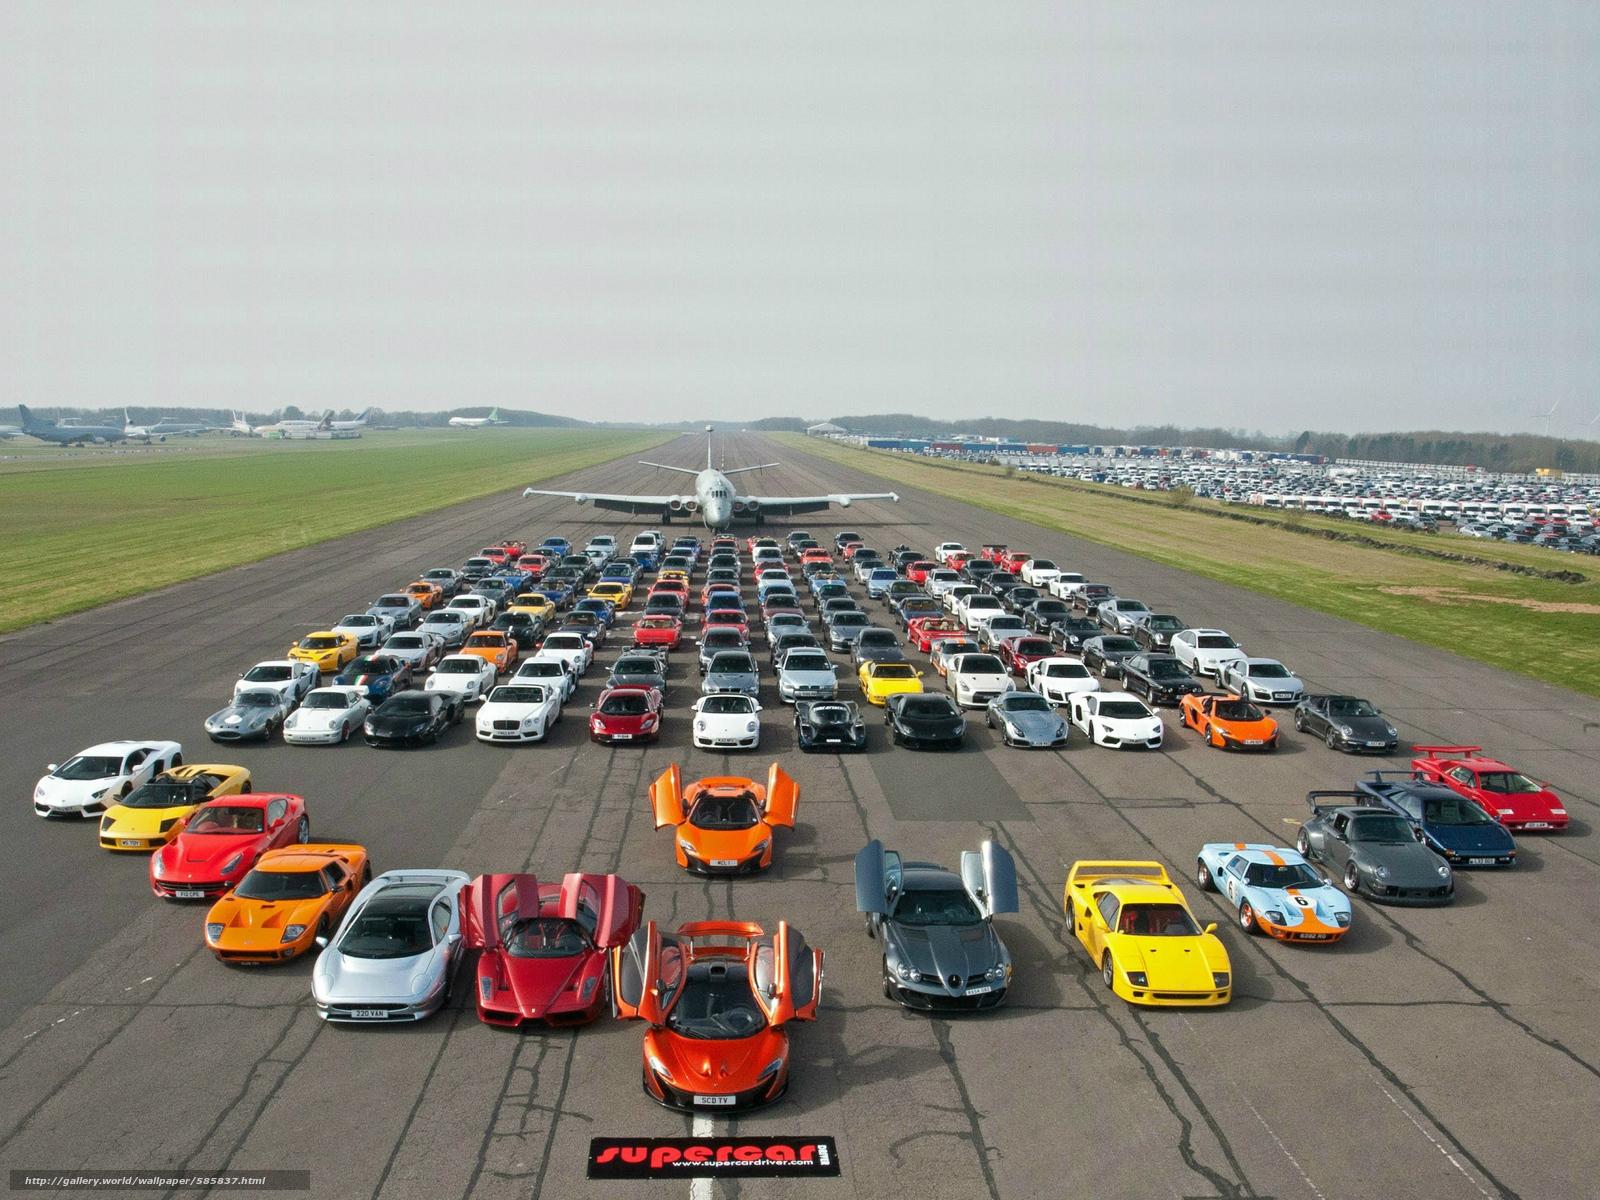 Tlcharger fond d 39 ecran supercars route avion supercars - 2048 supercars ...